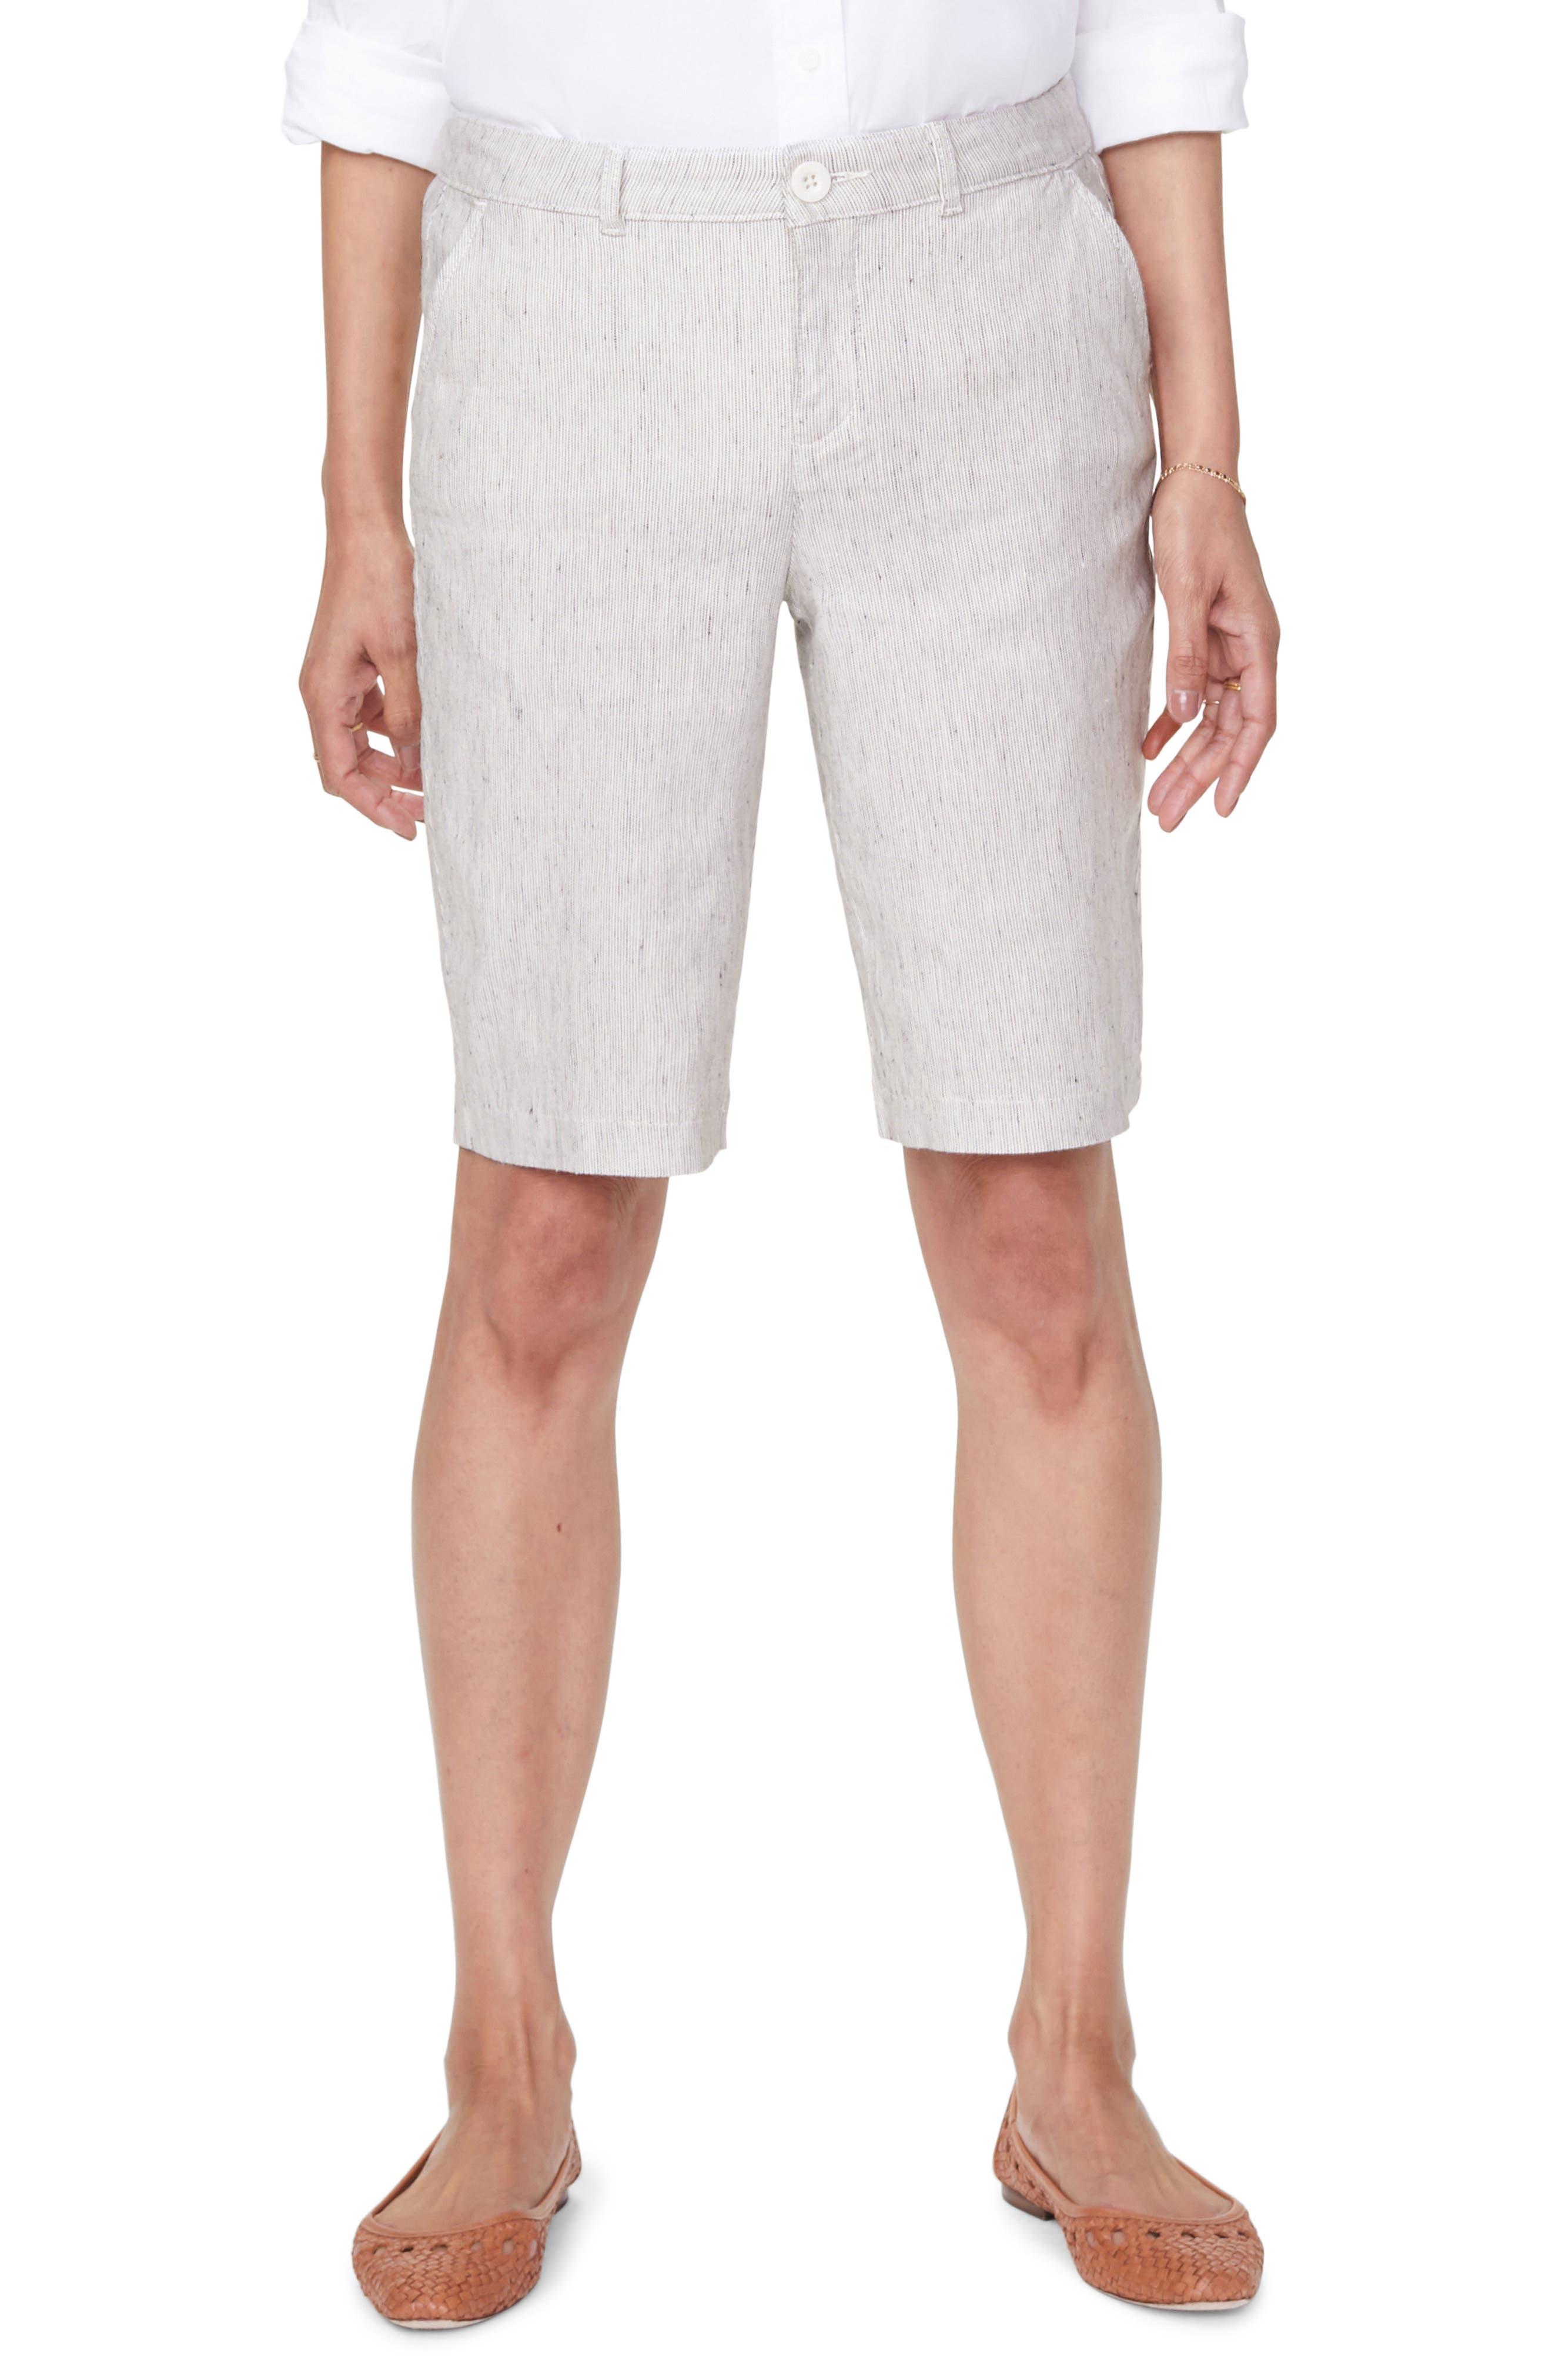 Women's Nydj Stretch Linen Blend Bermuda Shorts,  18 (similar to 14W) - Beige